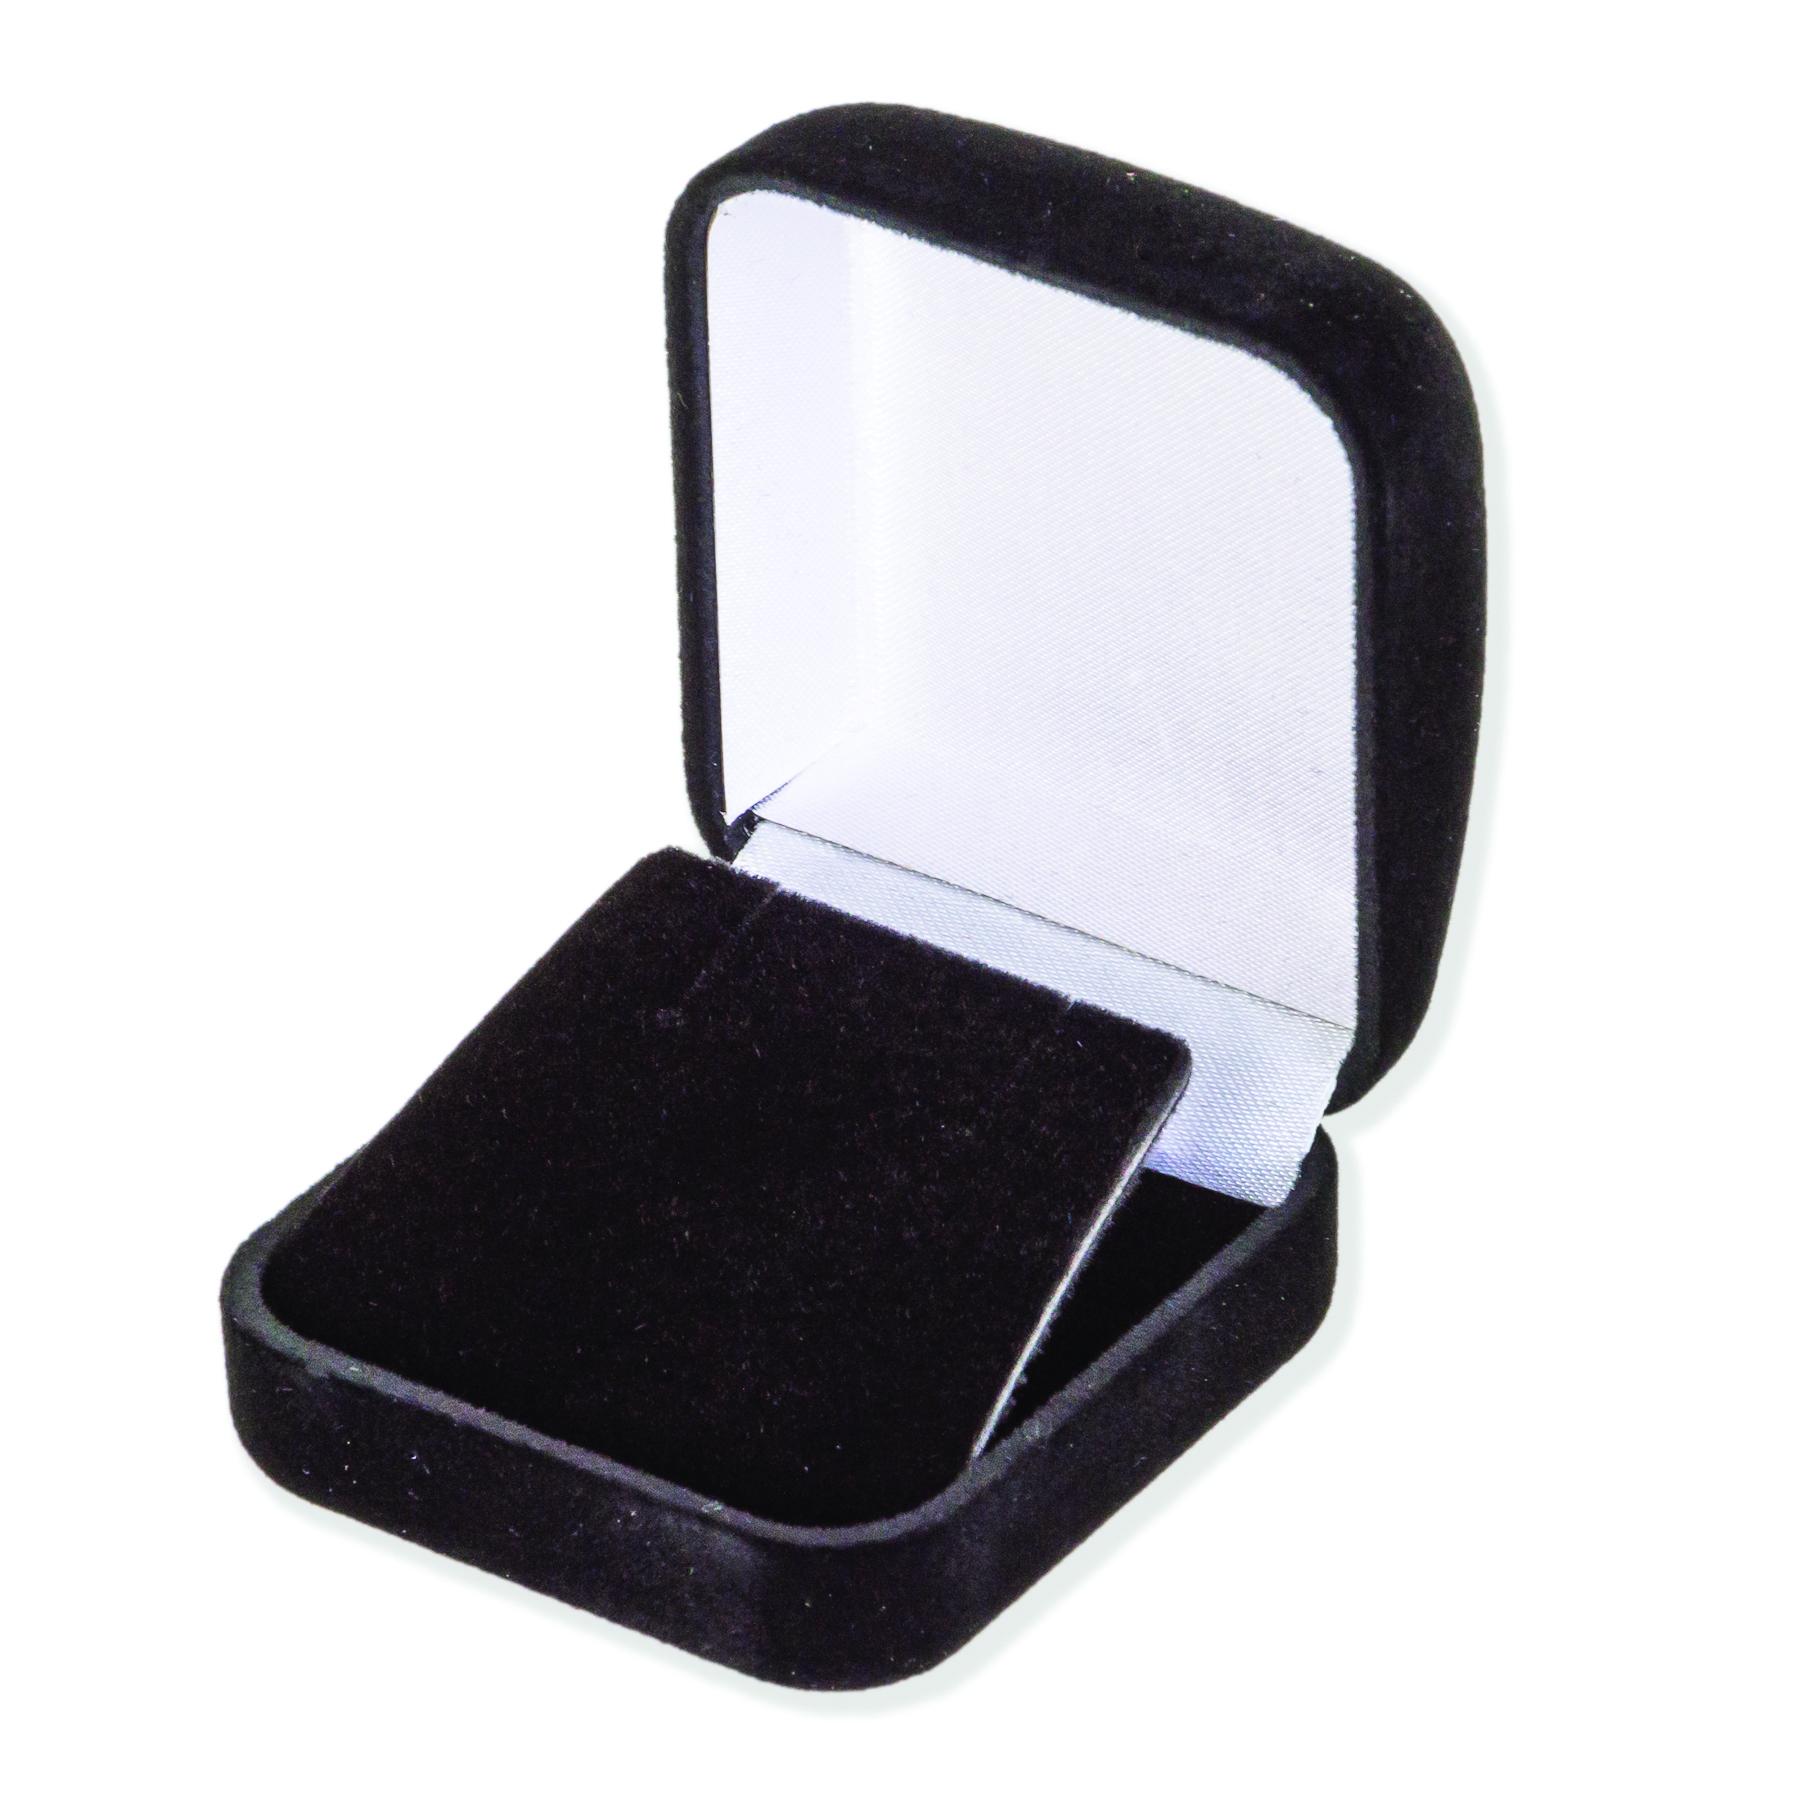 Modena Earring Boxes Image